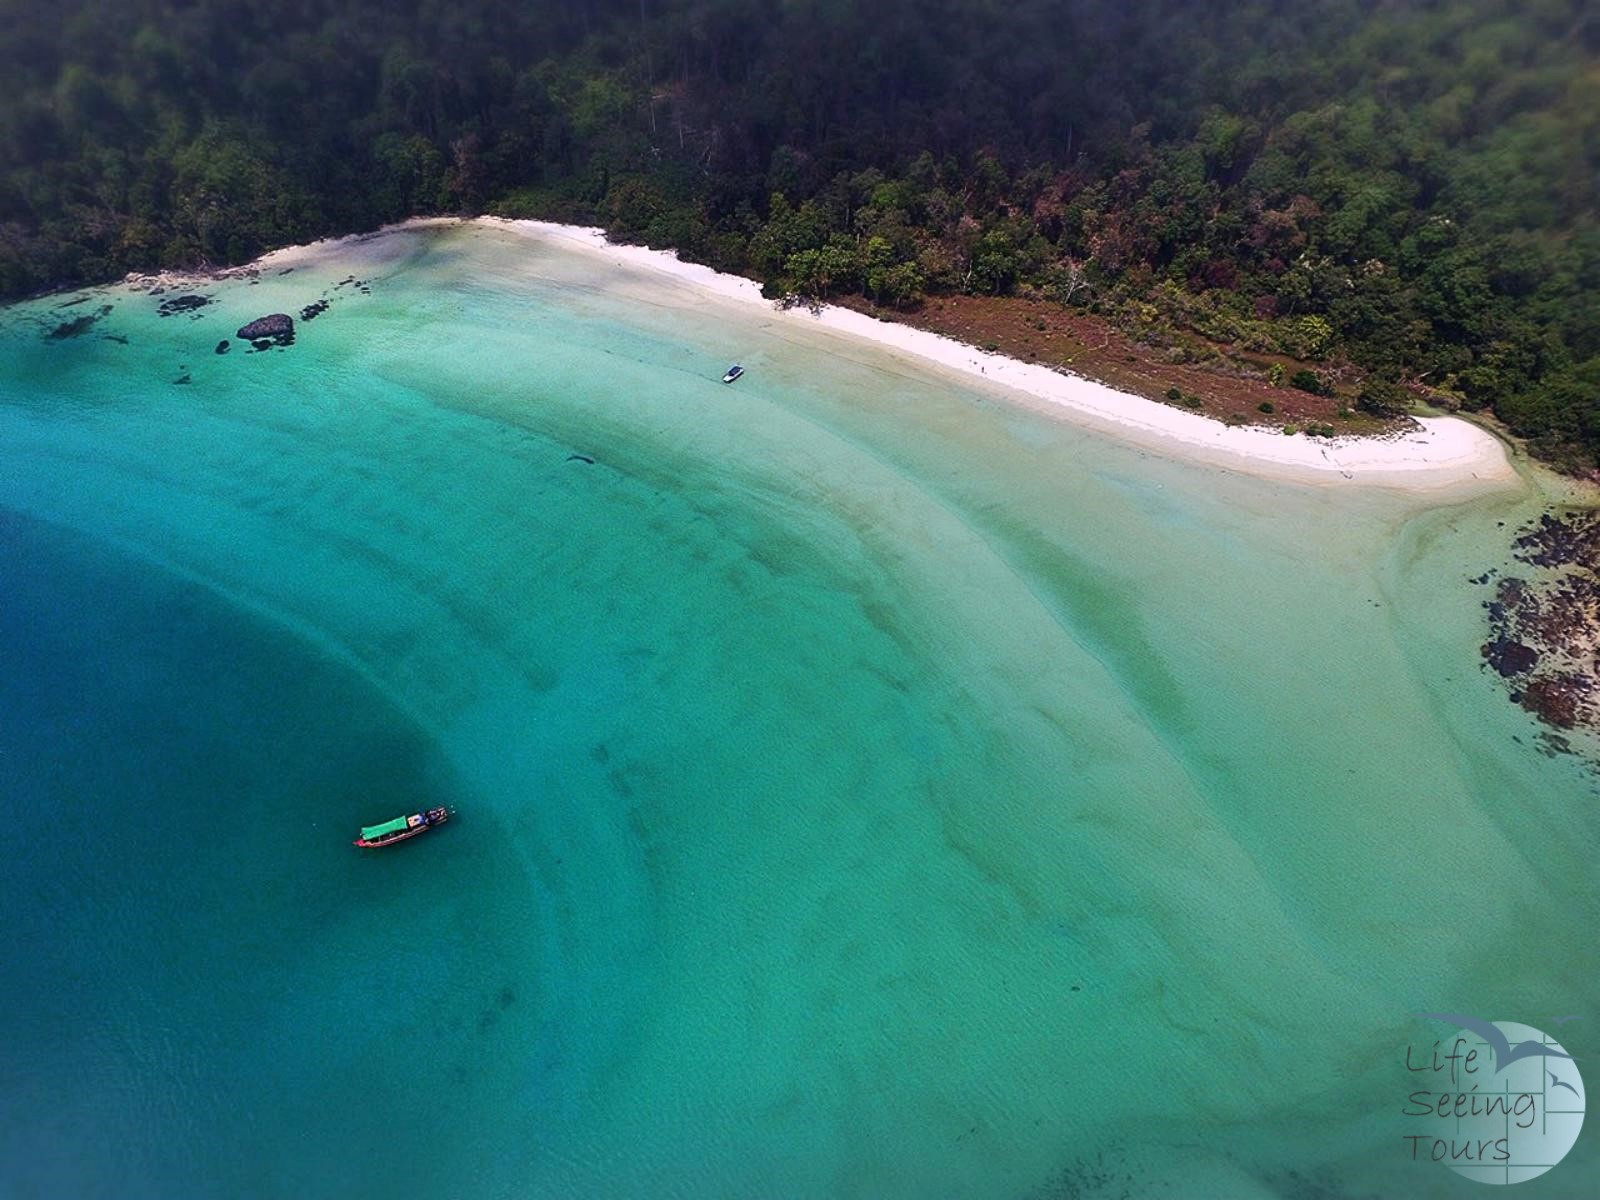 Thayaw Thahan Gyi - Tented Island Stay